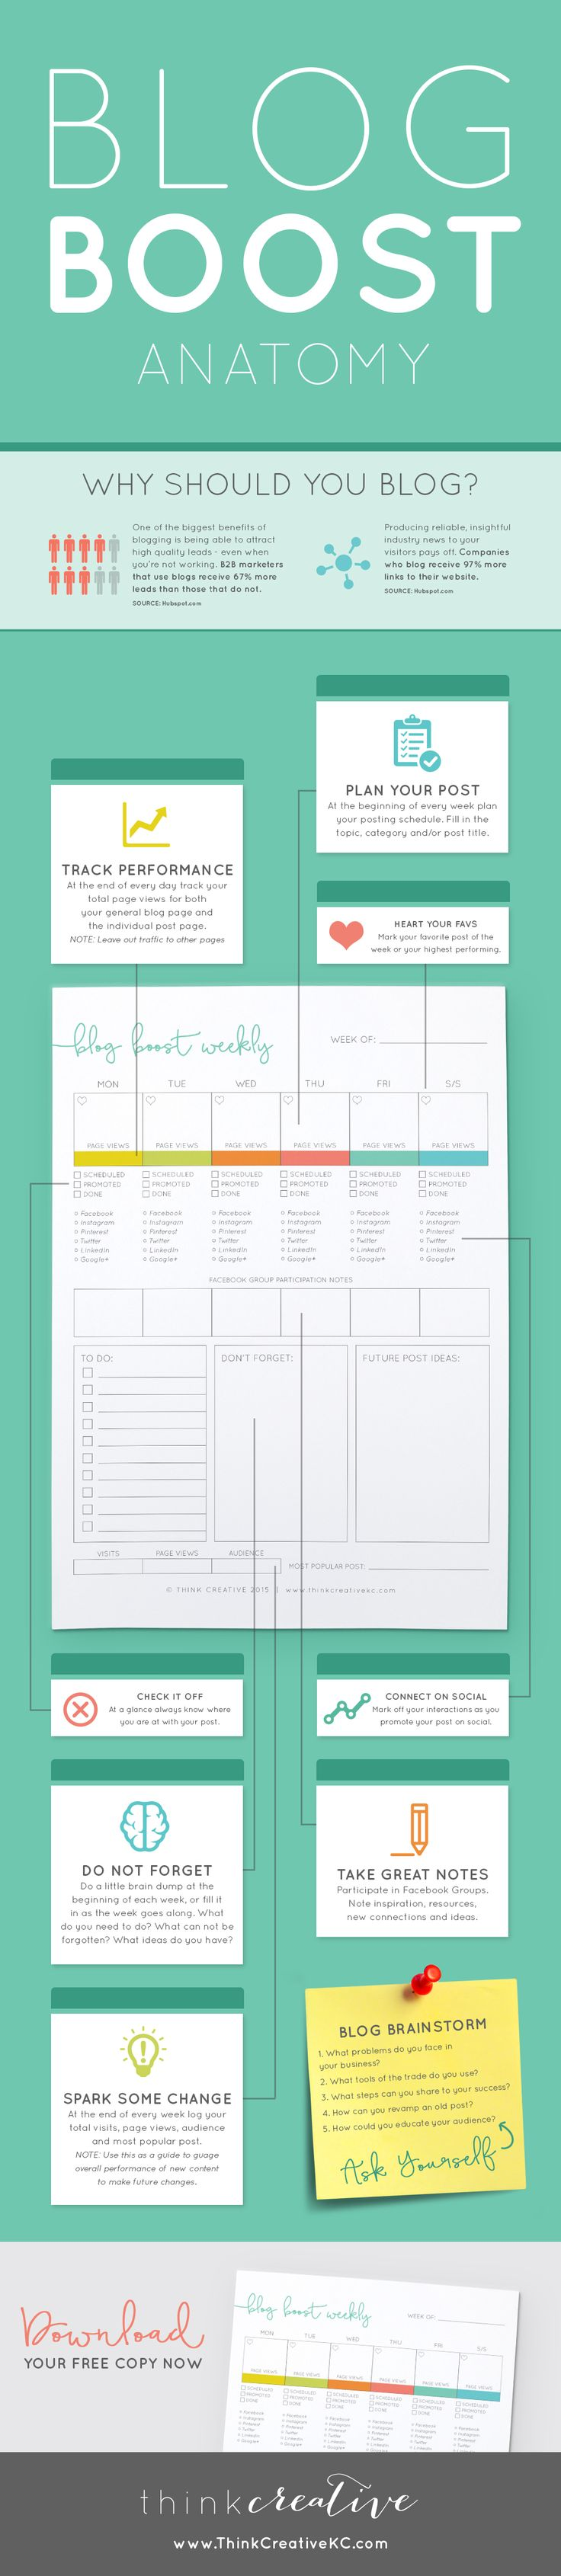 Blog Boost Anatomy (BONUS: Blog Planning & Analysis Printable) — Think Creative Collective